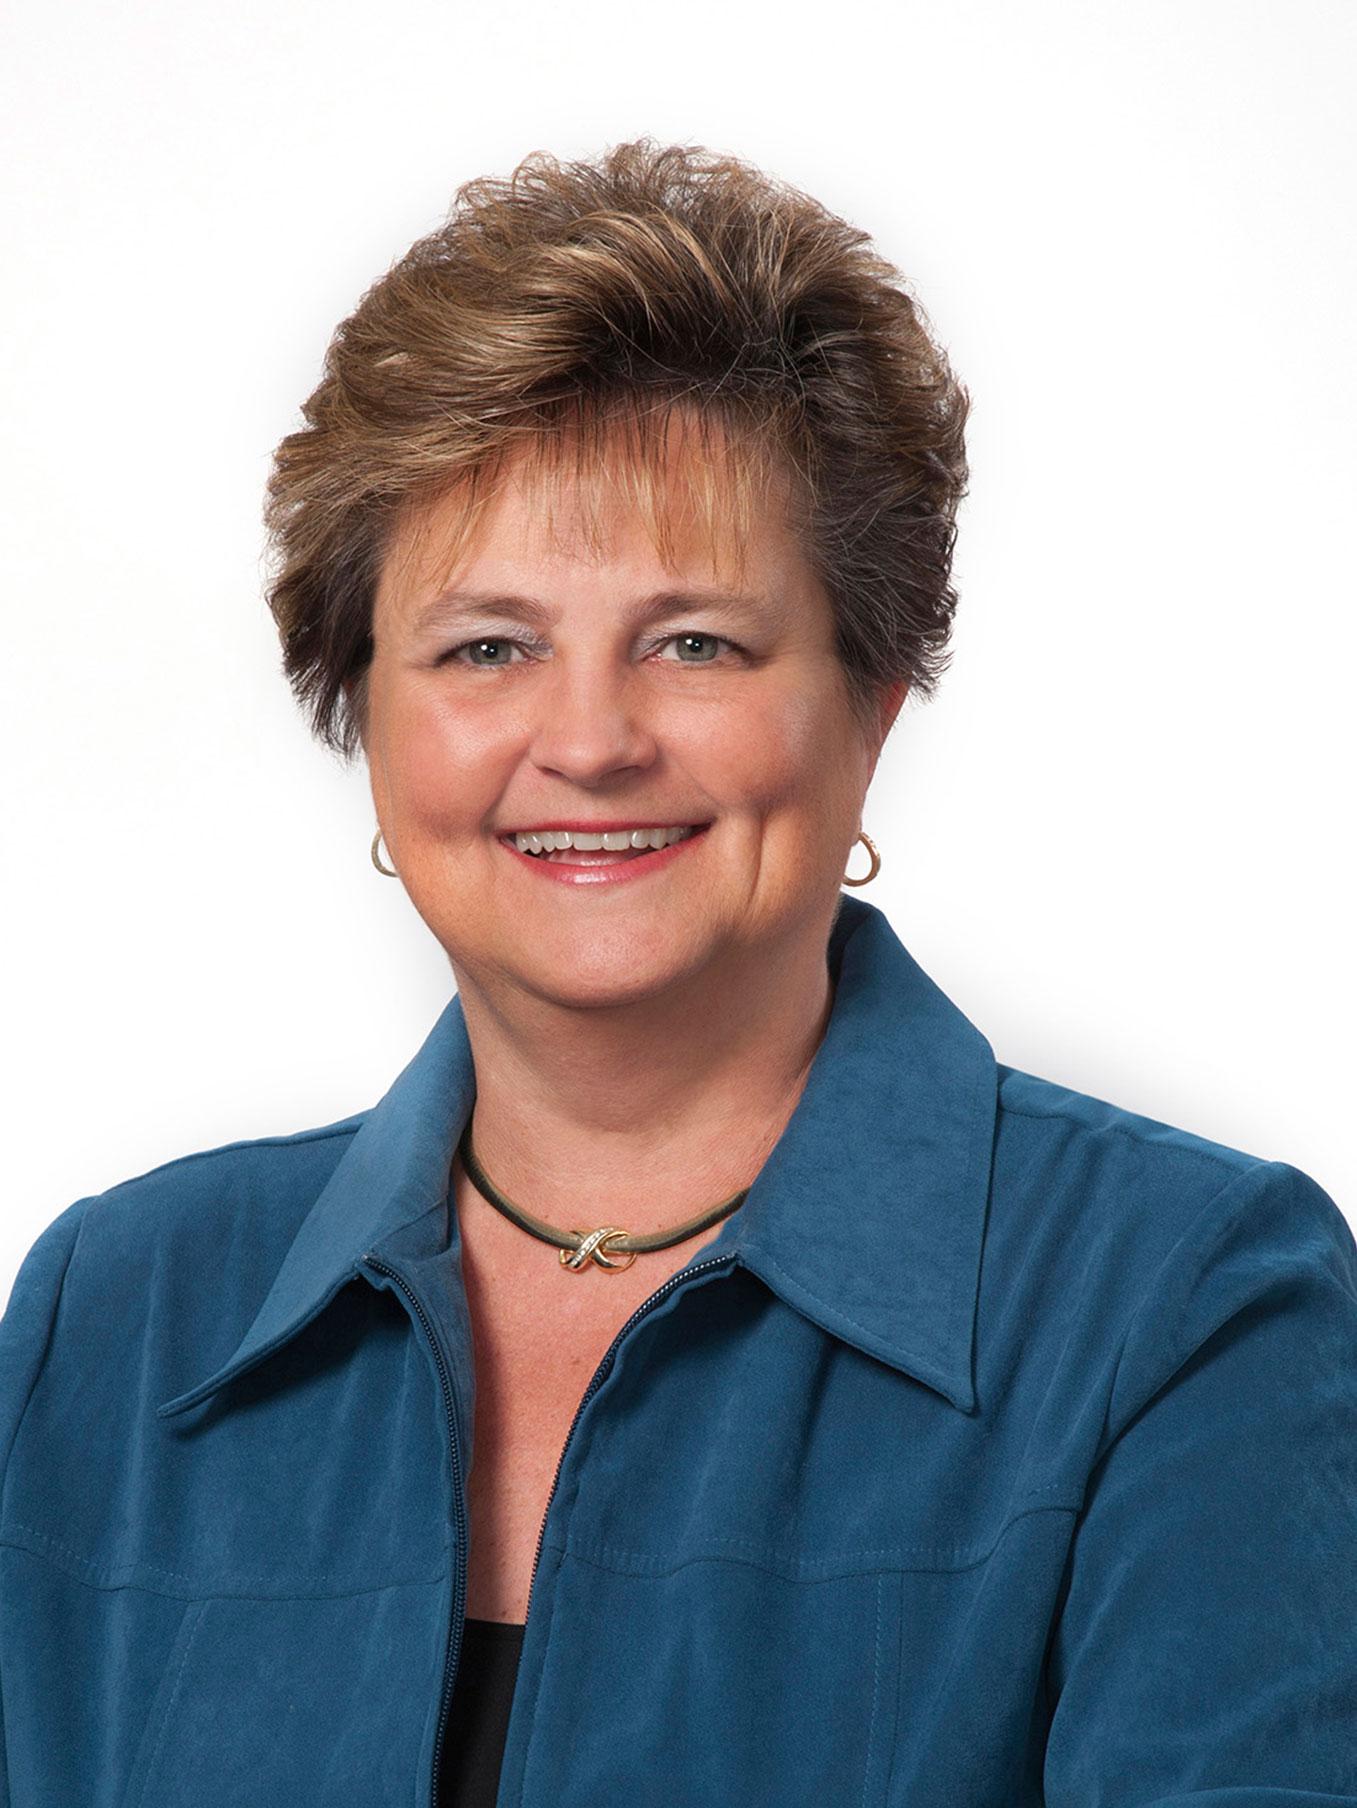 Joanne J. Amrhein, Administrative Assistant of Day Hagan Asset Management in Sarasota, FL.